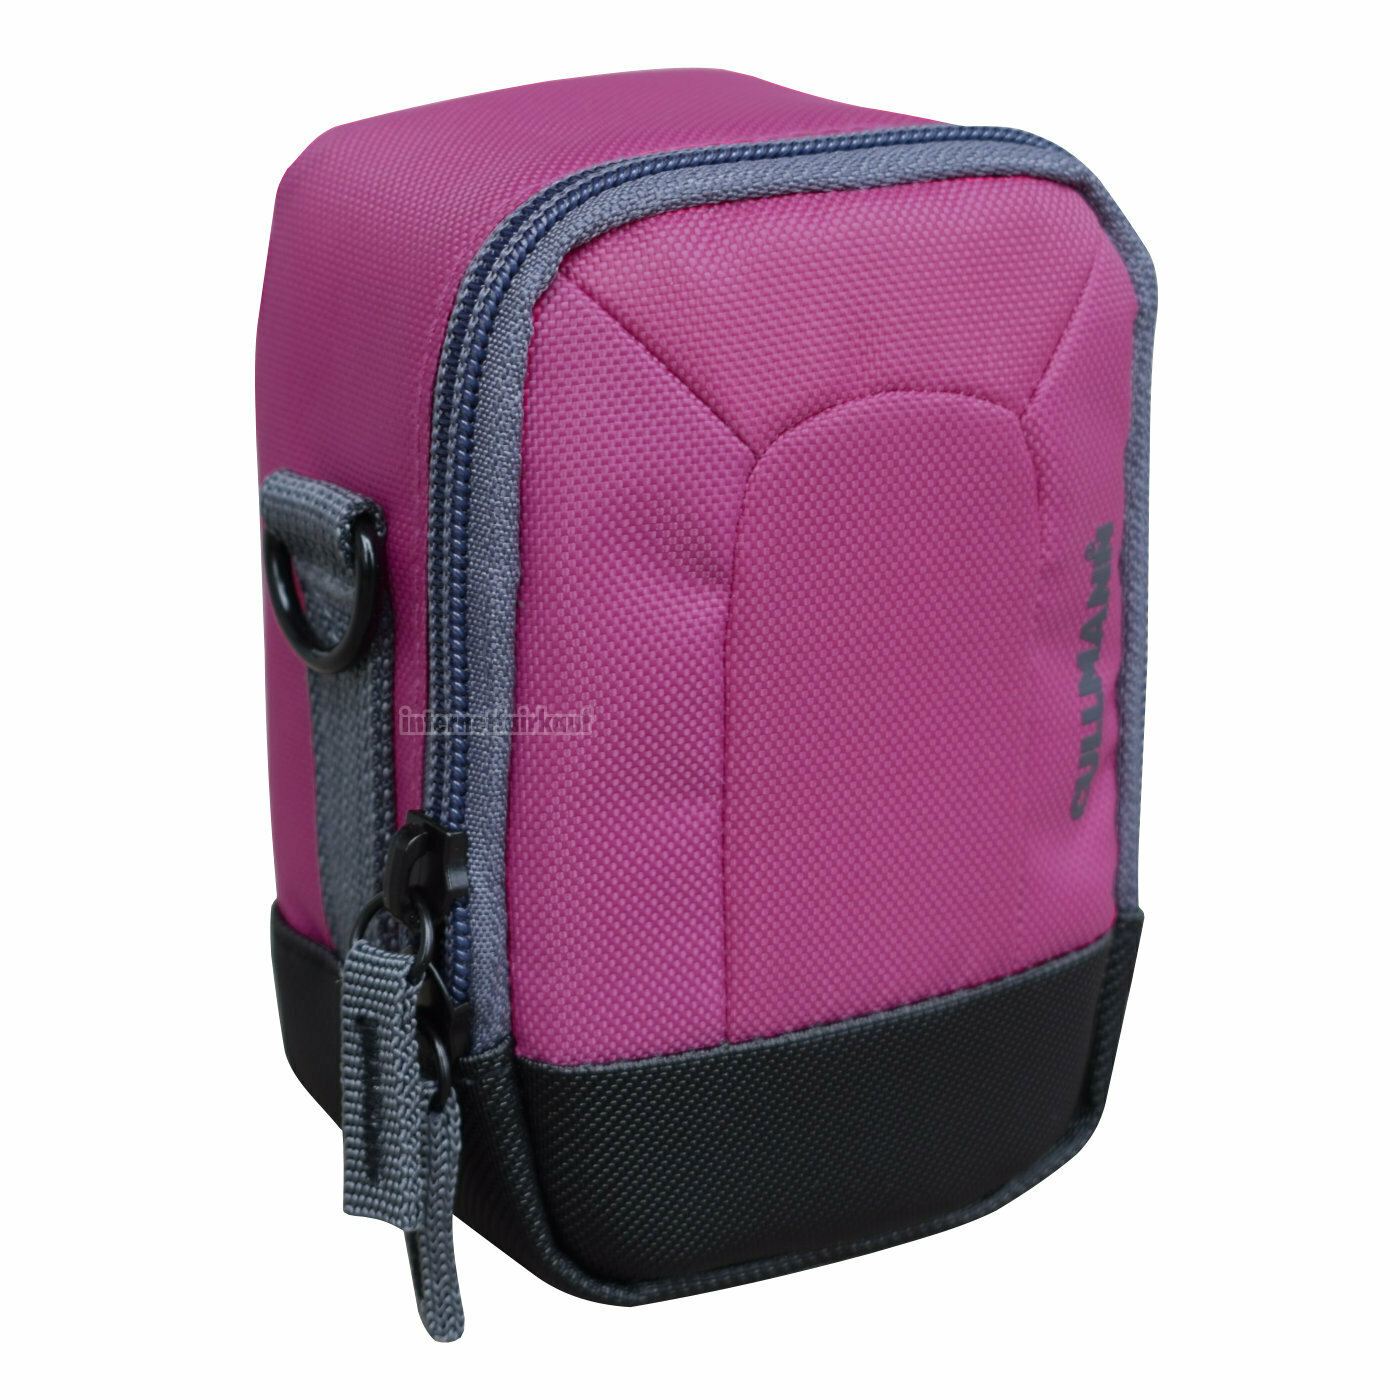 Kameratasche purple passend für Panasonic Lumix DMC-LX100 I + II - Fototasche